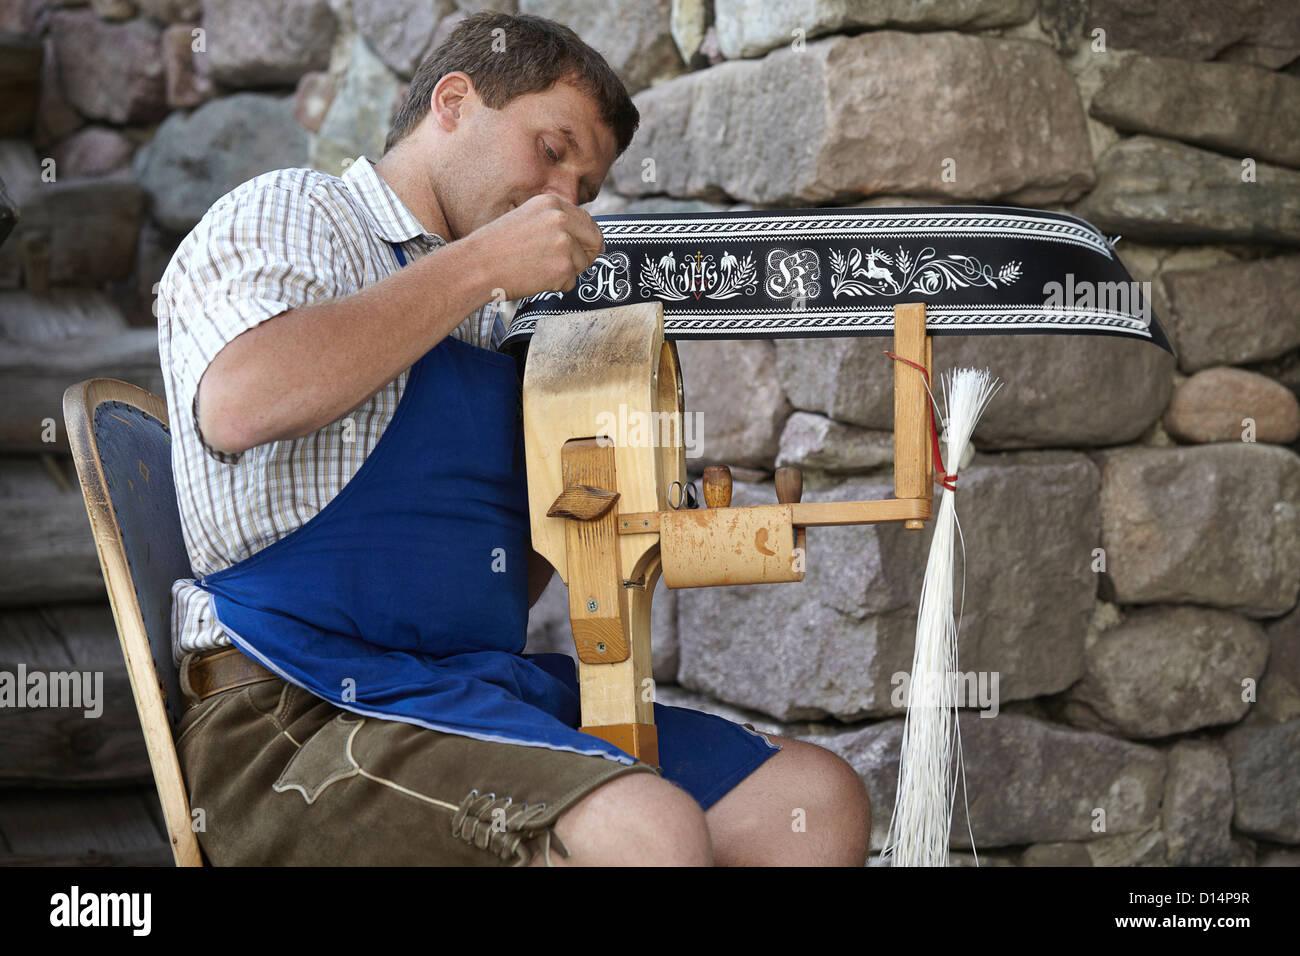 Worker weaving in shop - Stock Image